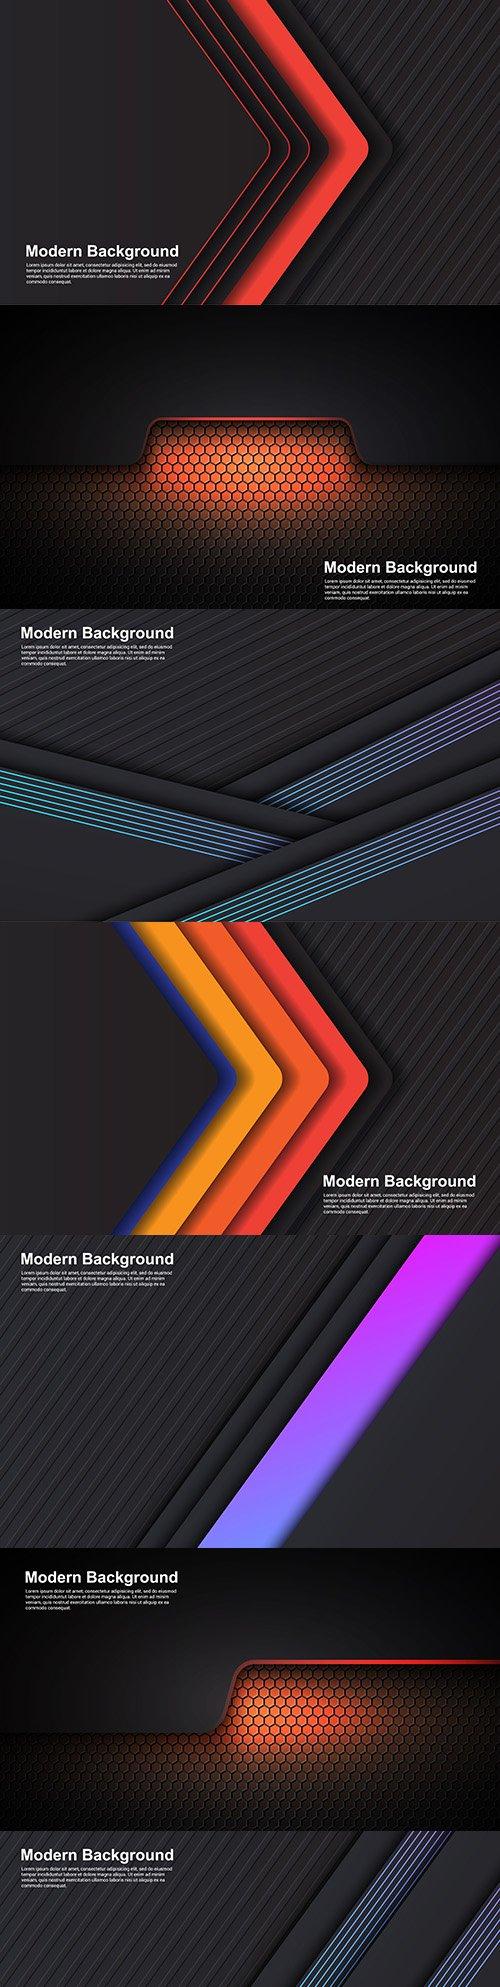 Modern design dark background with colored elements